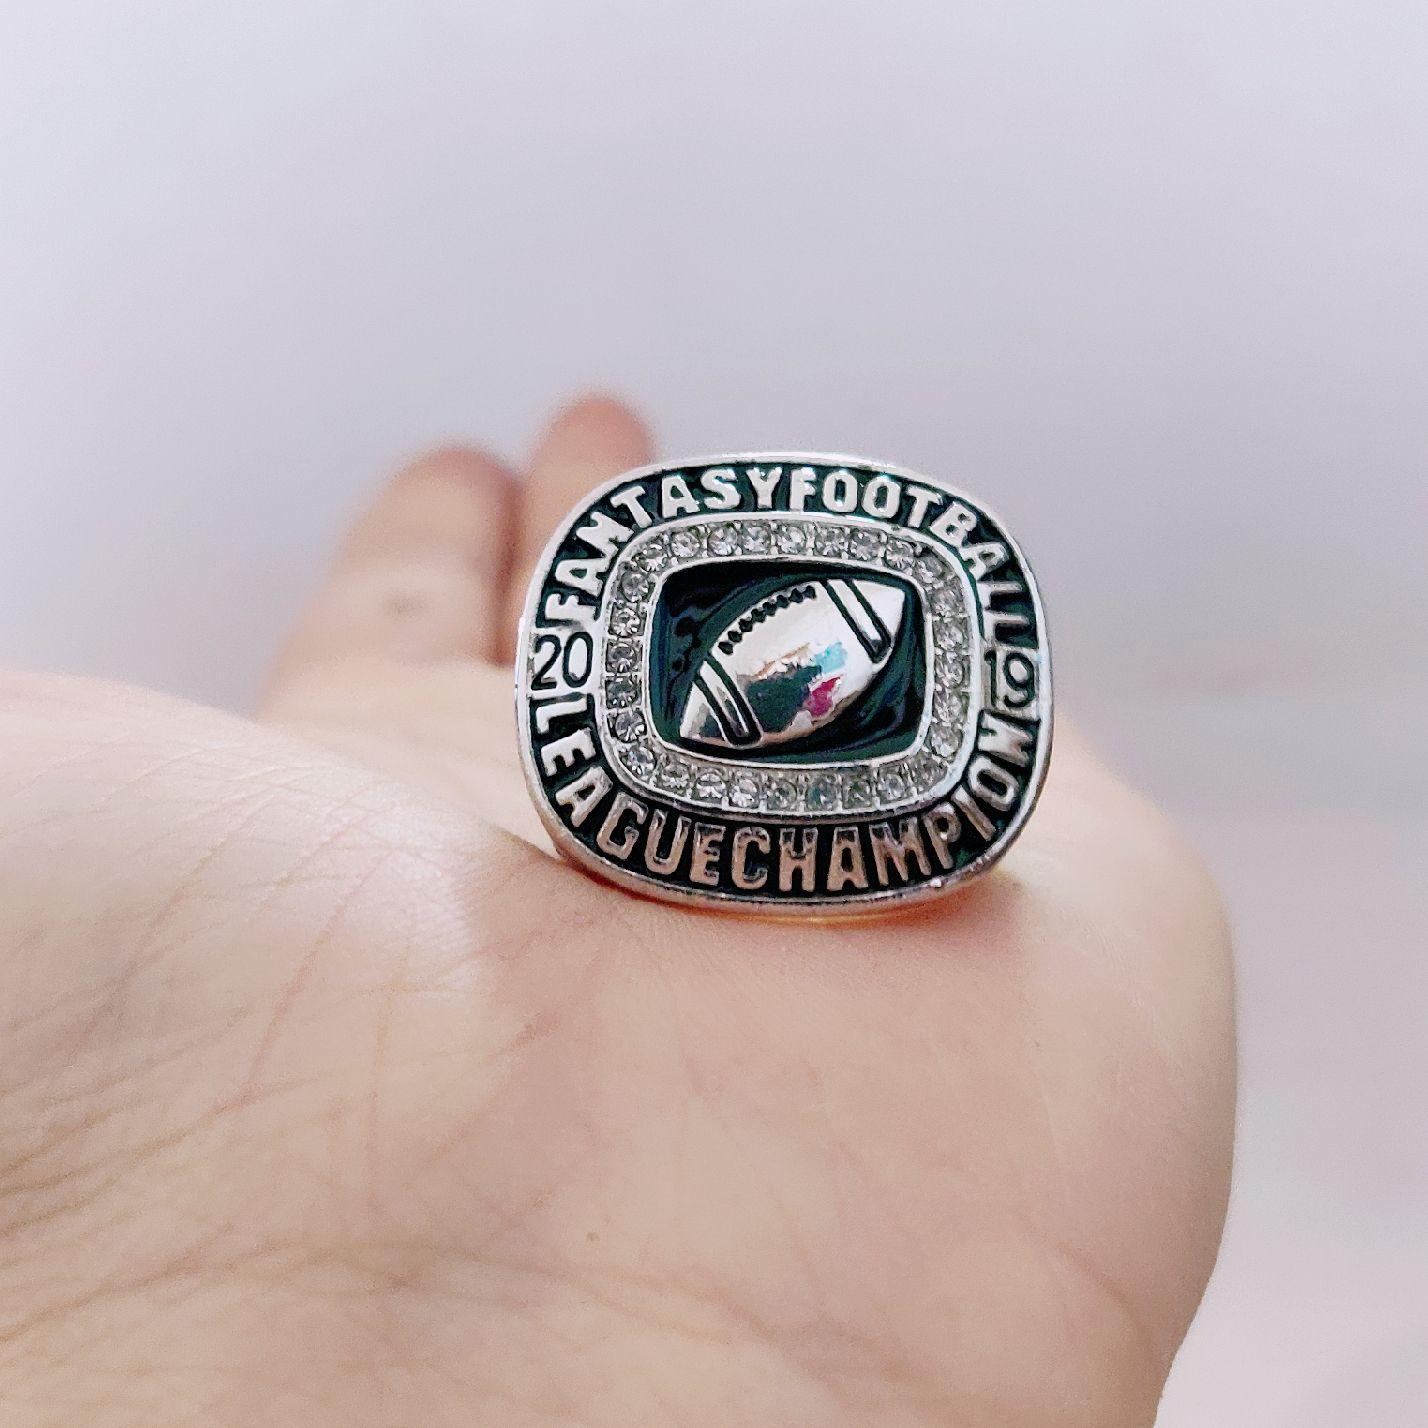 2018 2019 Fantasy League Football FFL Championship Ring Men Fan Souvenir Gift Drop Shipping all'ingrosso